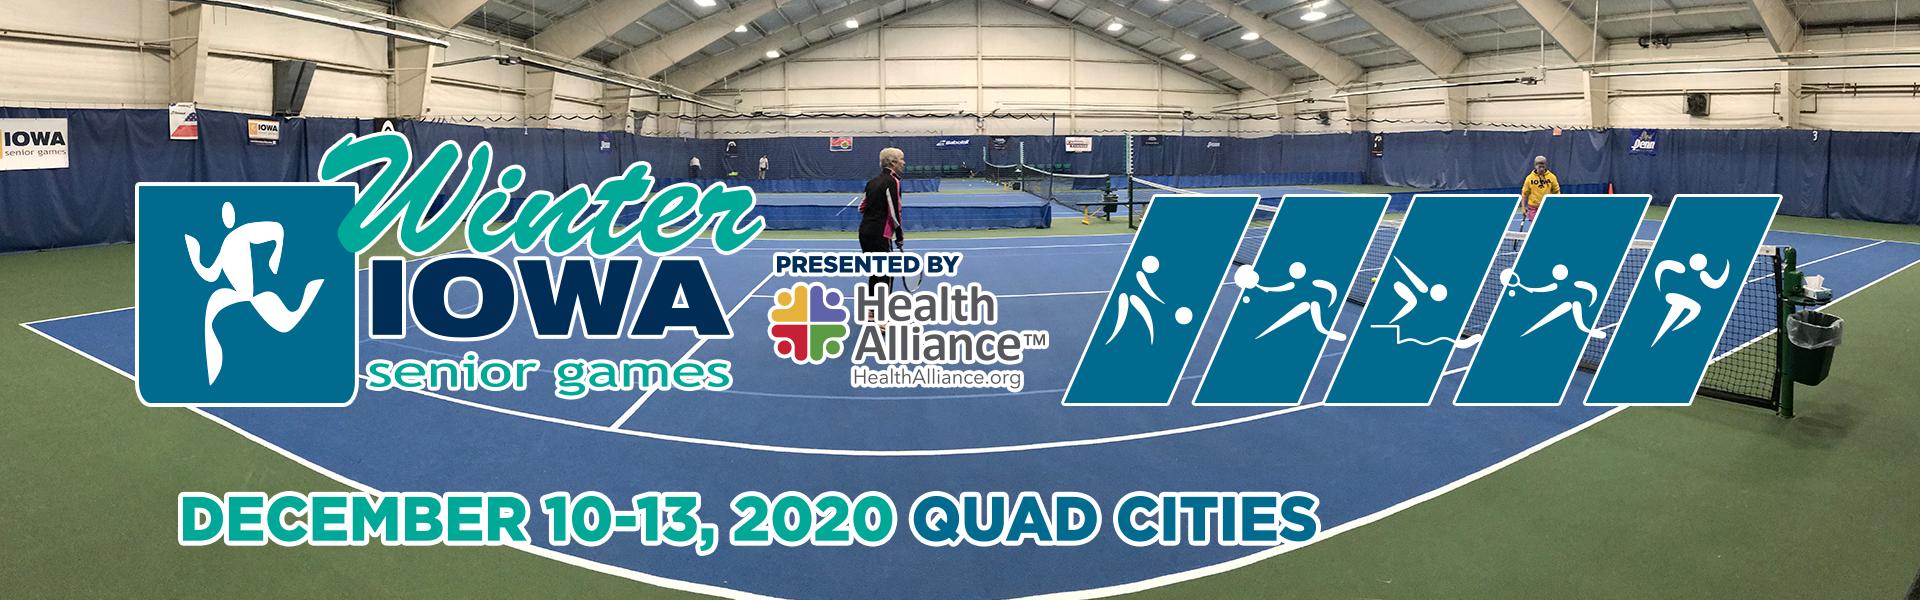 2020 Winter Iowa Senior Games